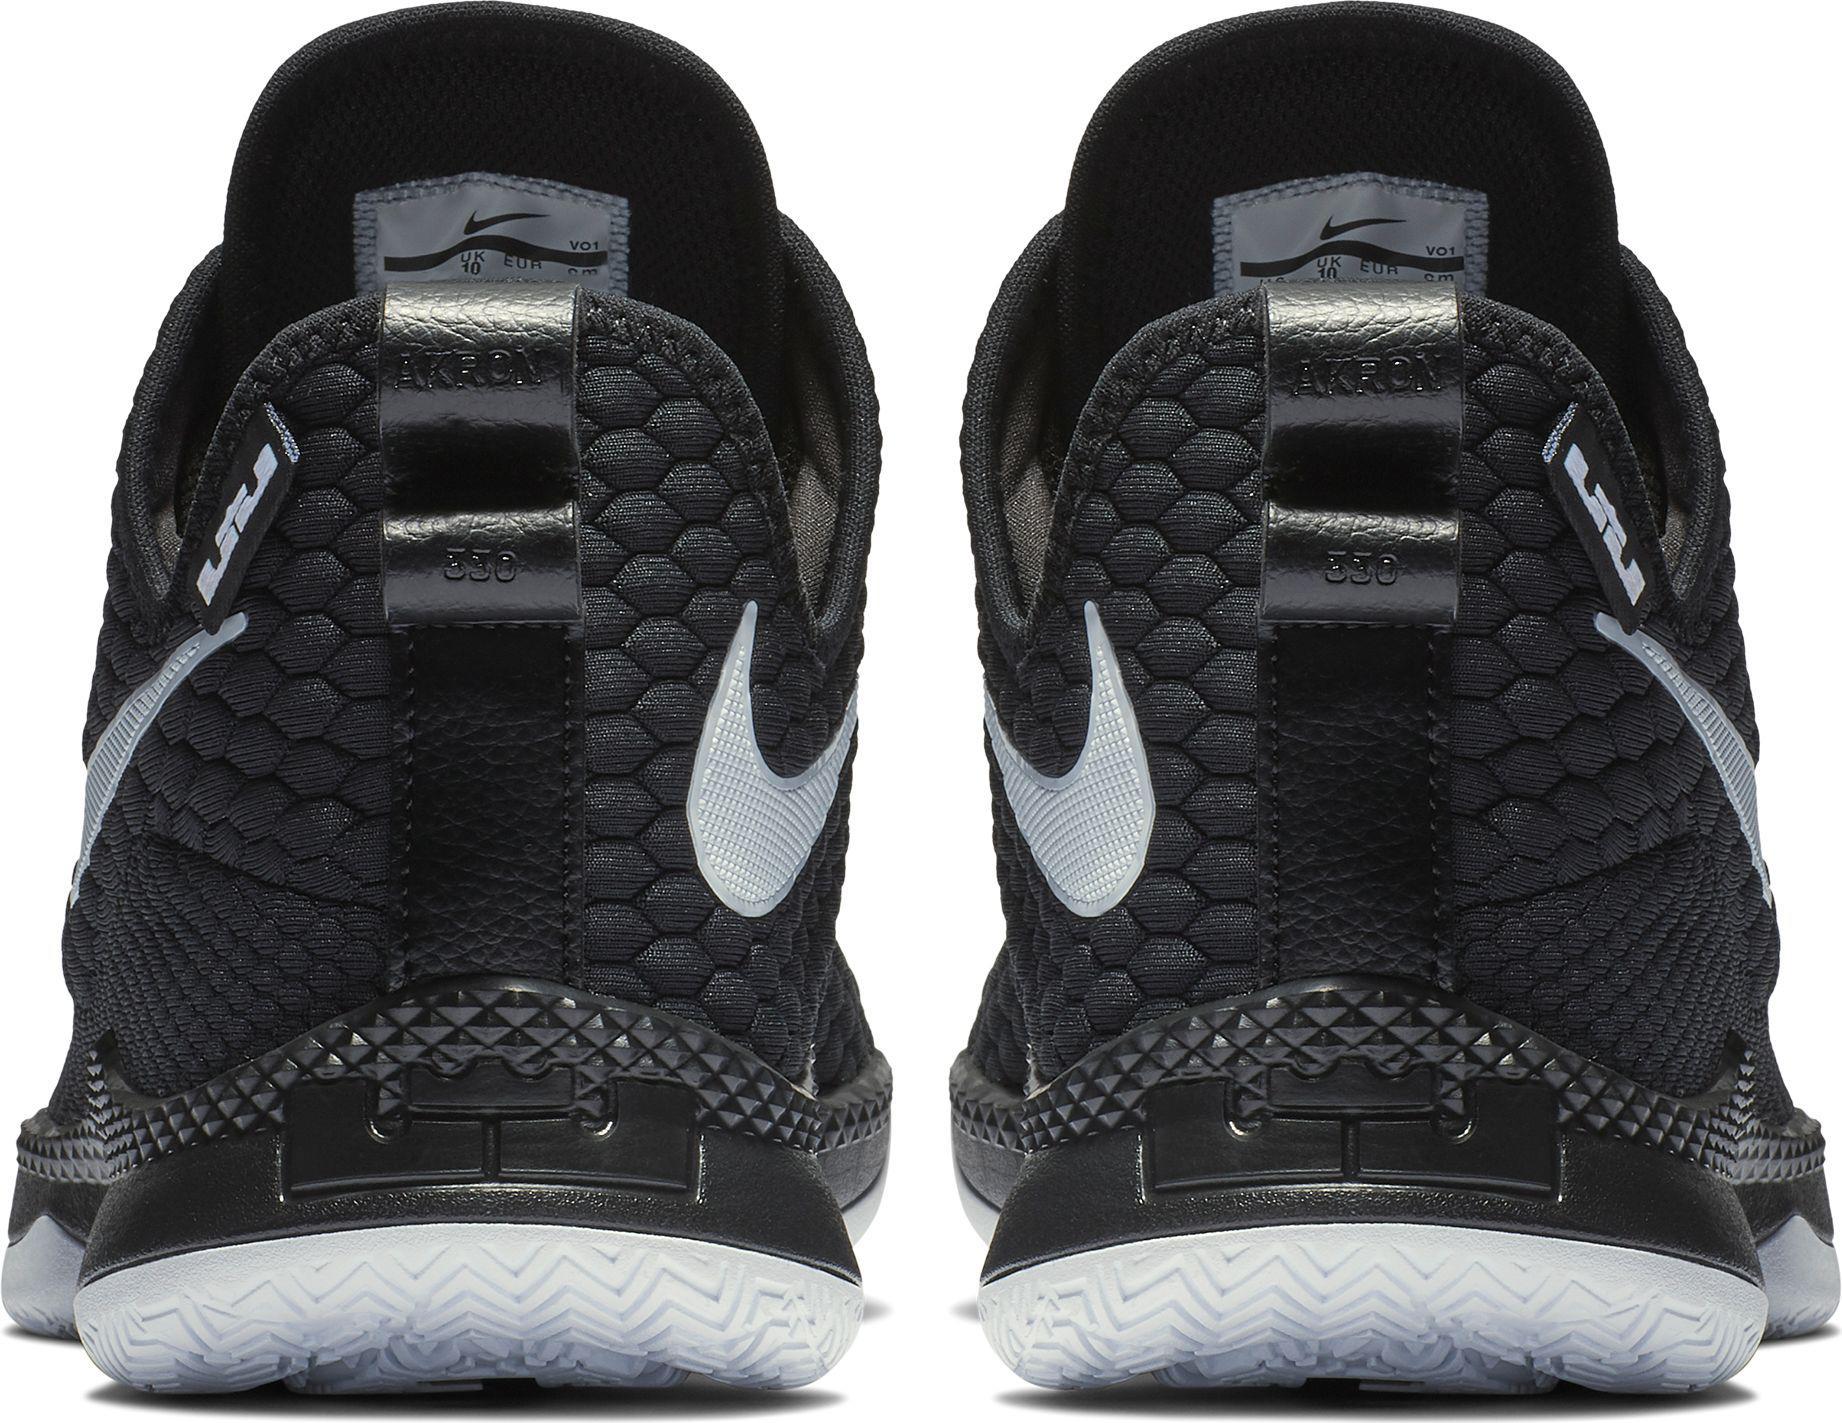 b4b67e2b Nike Lebron Witness Iii Basketball Shoes in Black for Men - Lyst